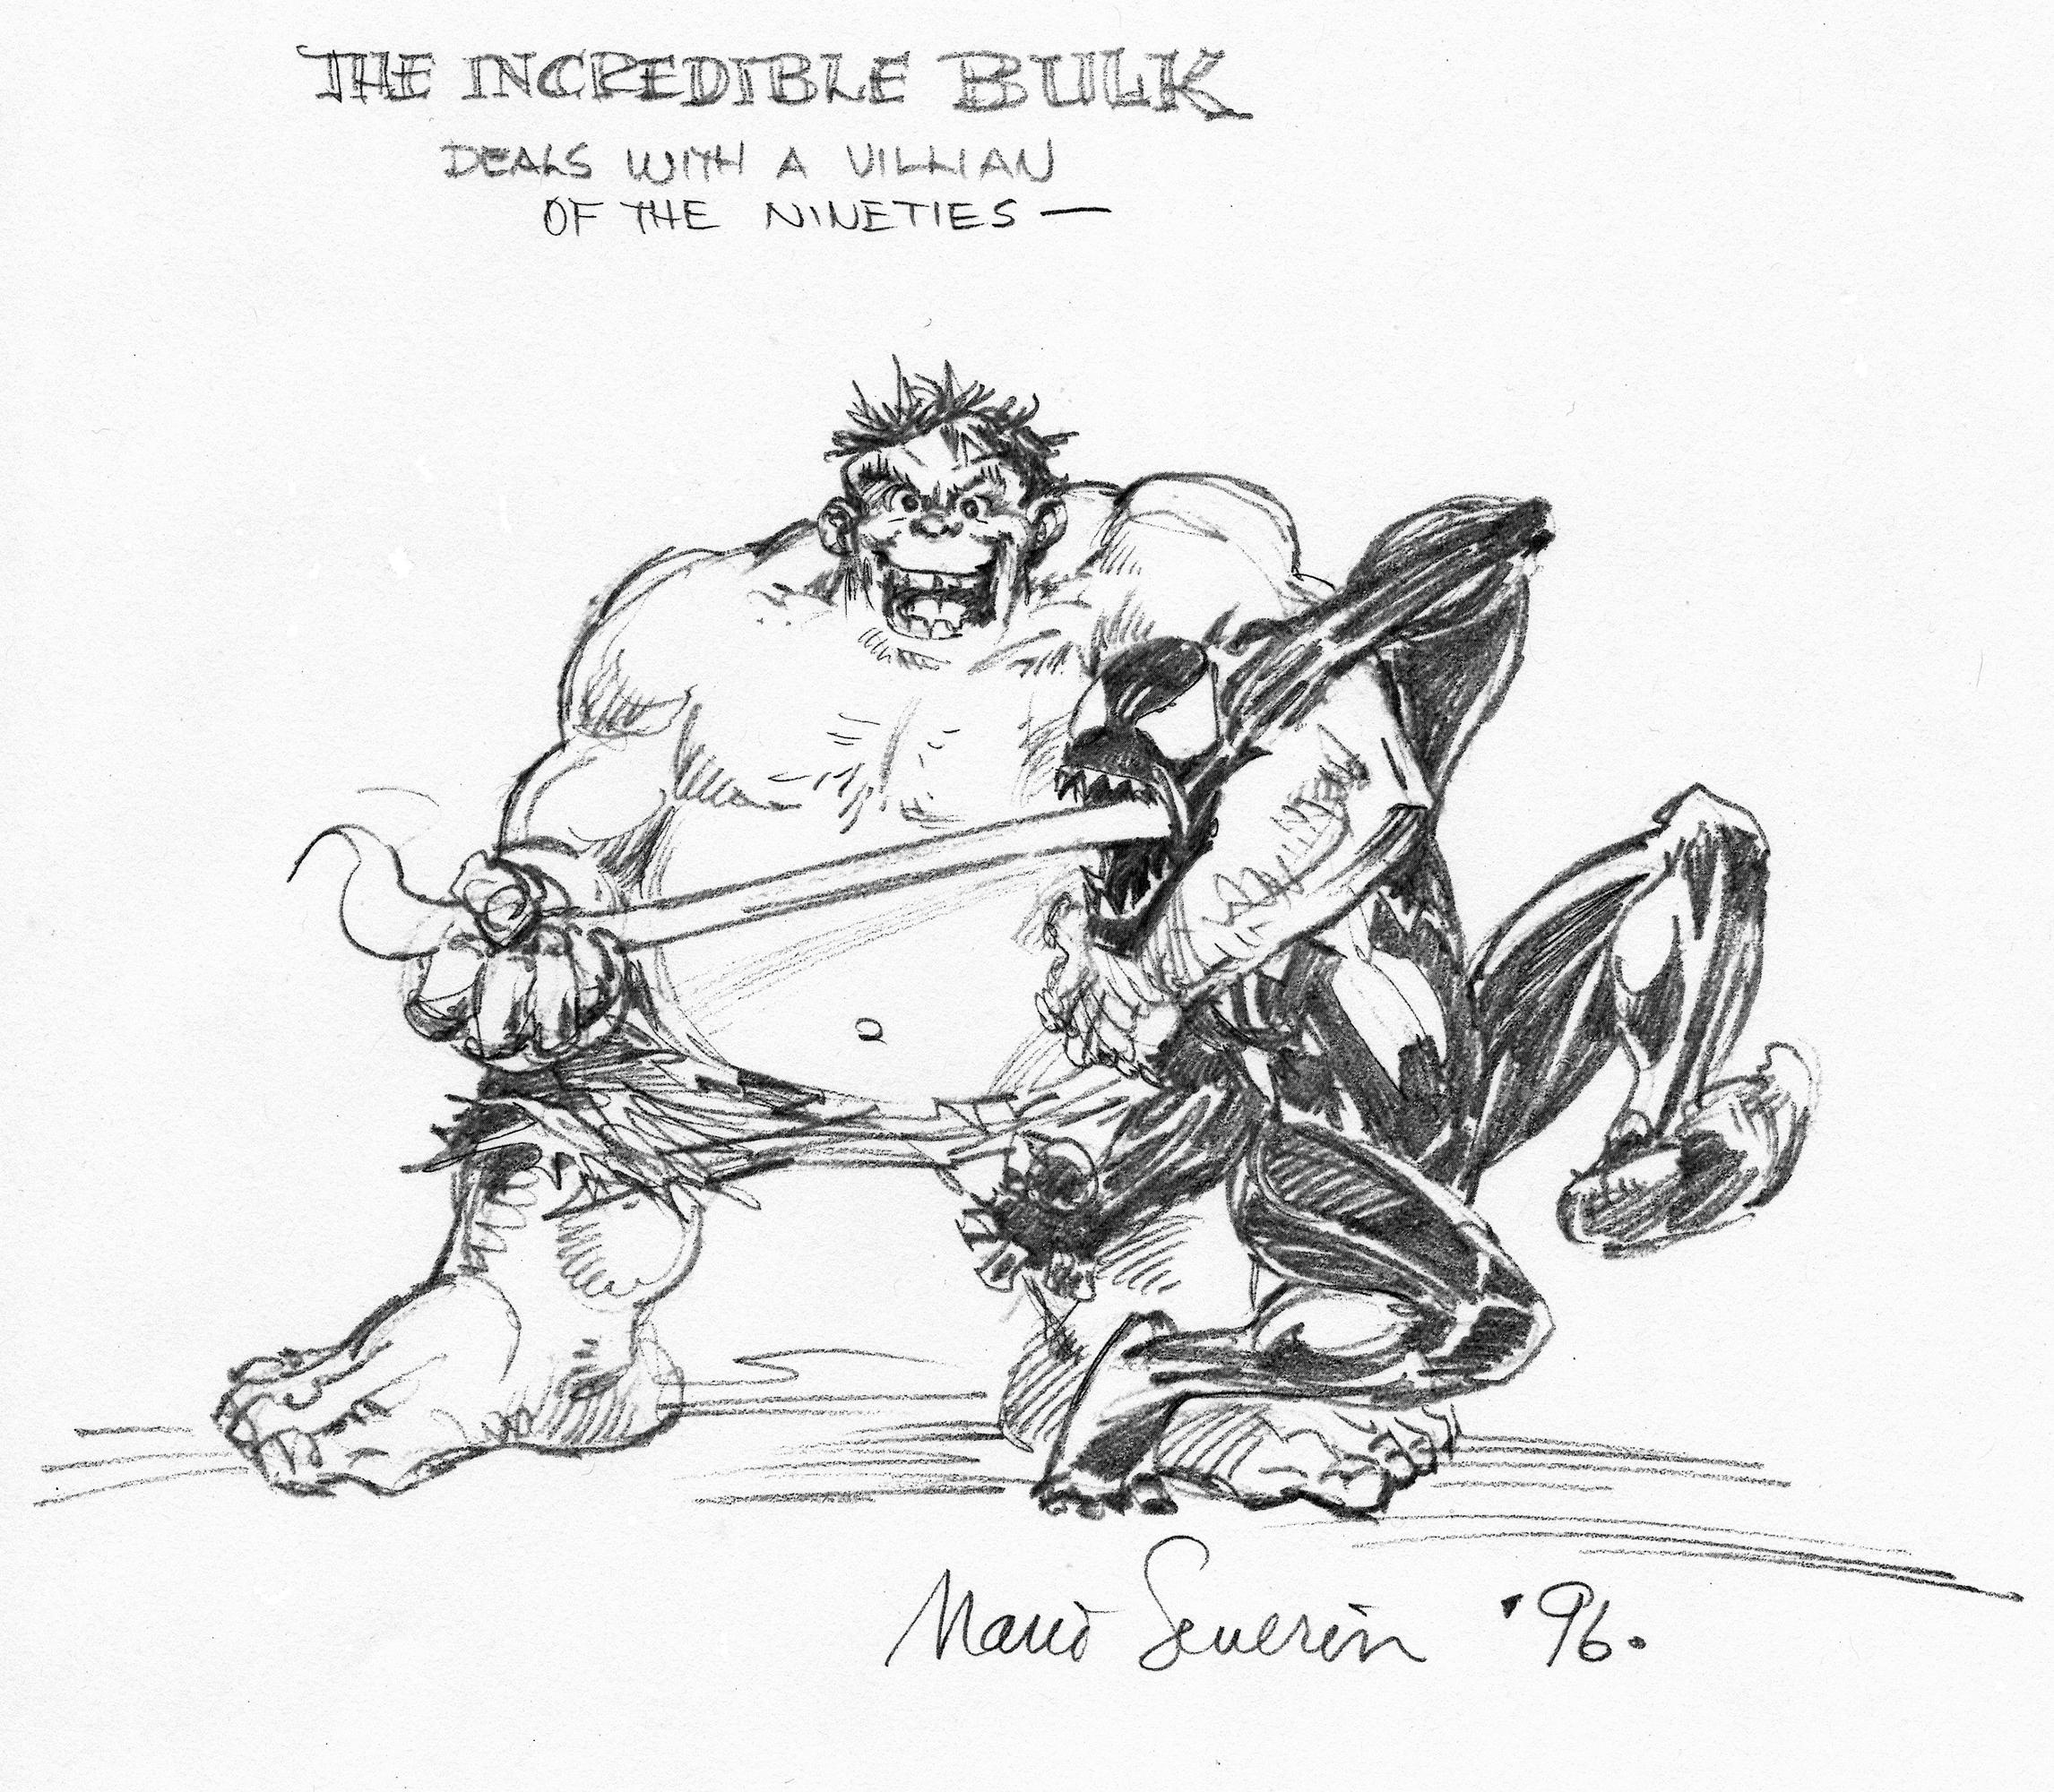 MARIE SEVERIN 1990�S HUMOROUS HULK ART Comic Art